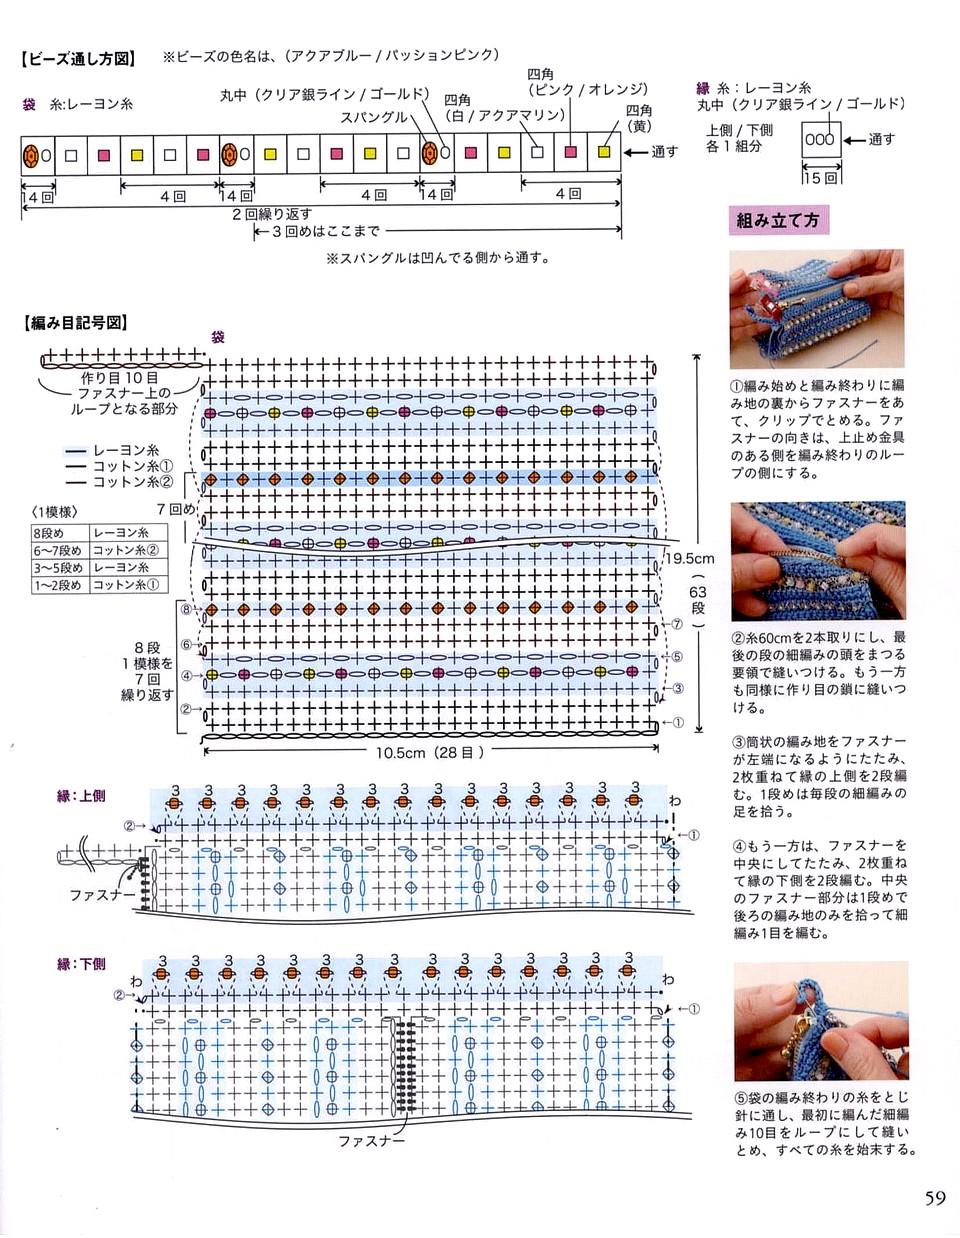 717 Beads Crochet 17-60